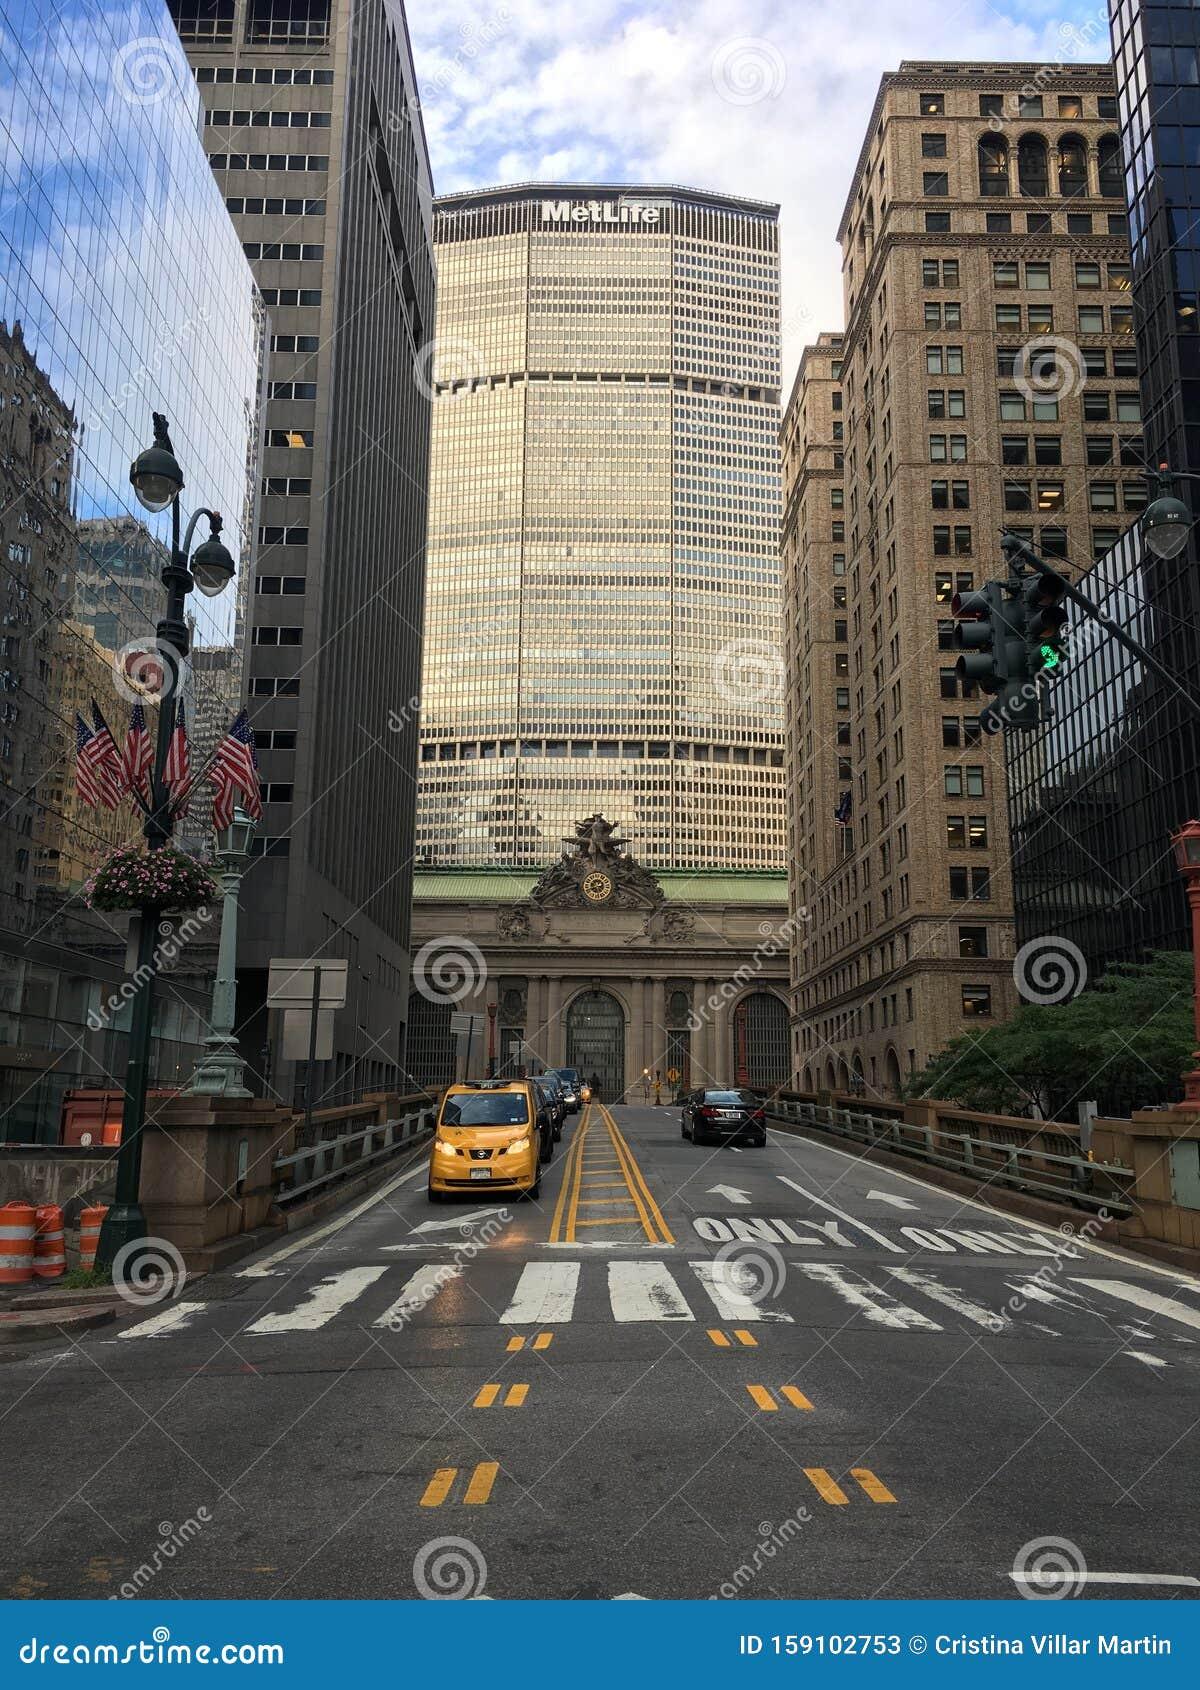 10 Metlife New York Photos   Free & Royalty Free Stock Photos ...